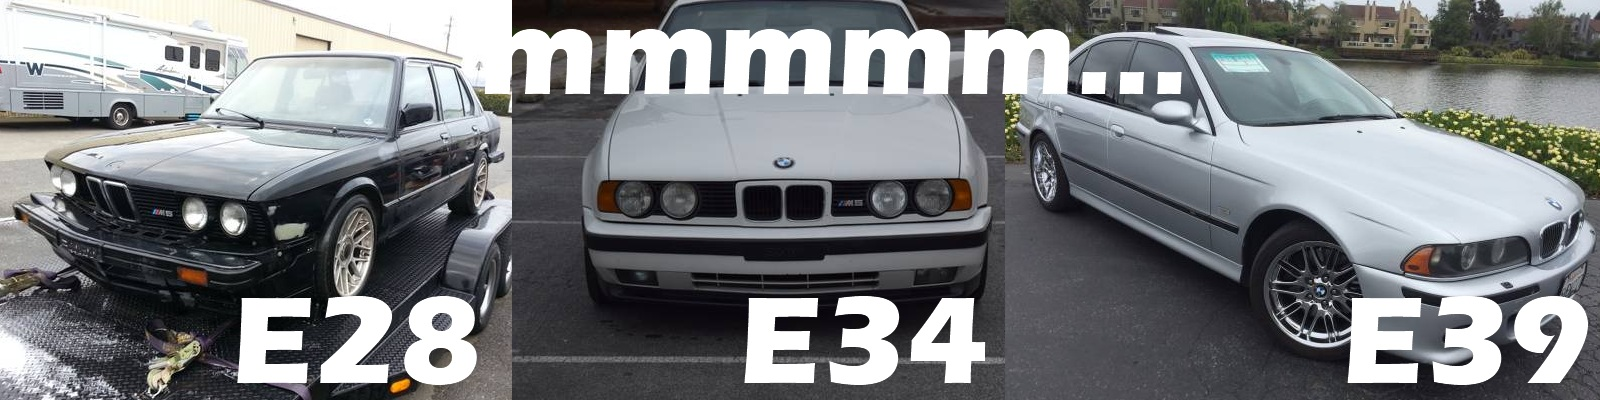 Craigslist San Jose >> Daily Turismo: $10k Used M5 Faceoff: BMW E28 vs E34 vs E39